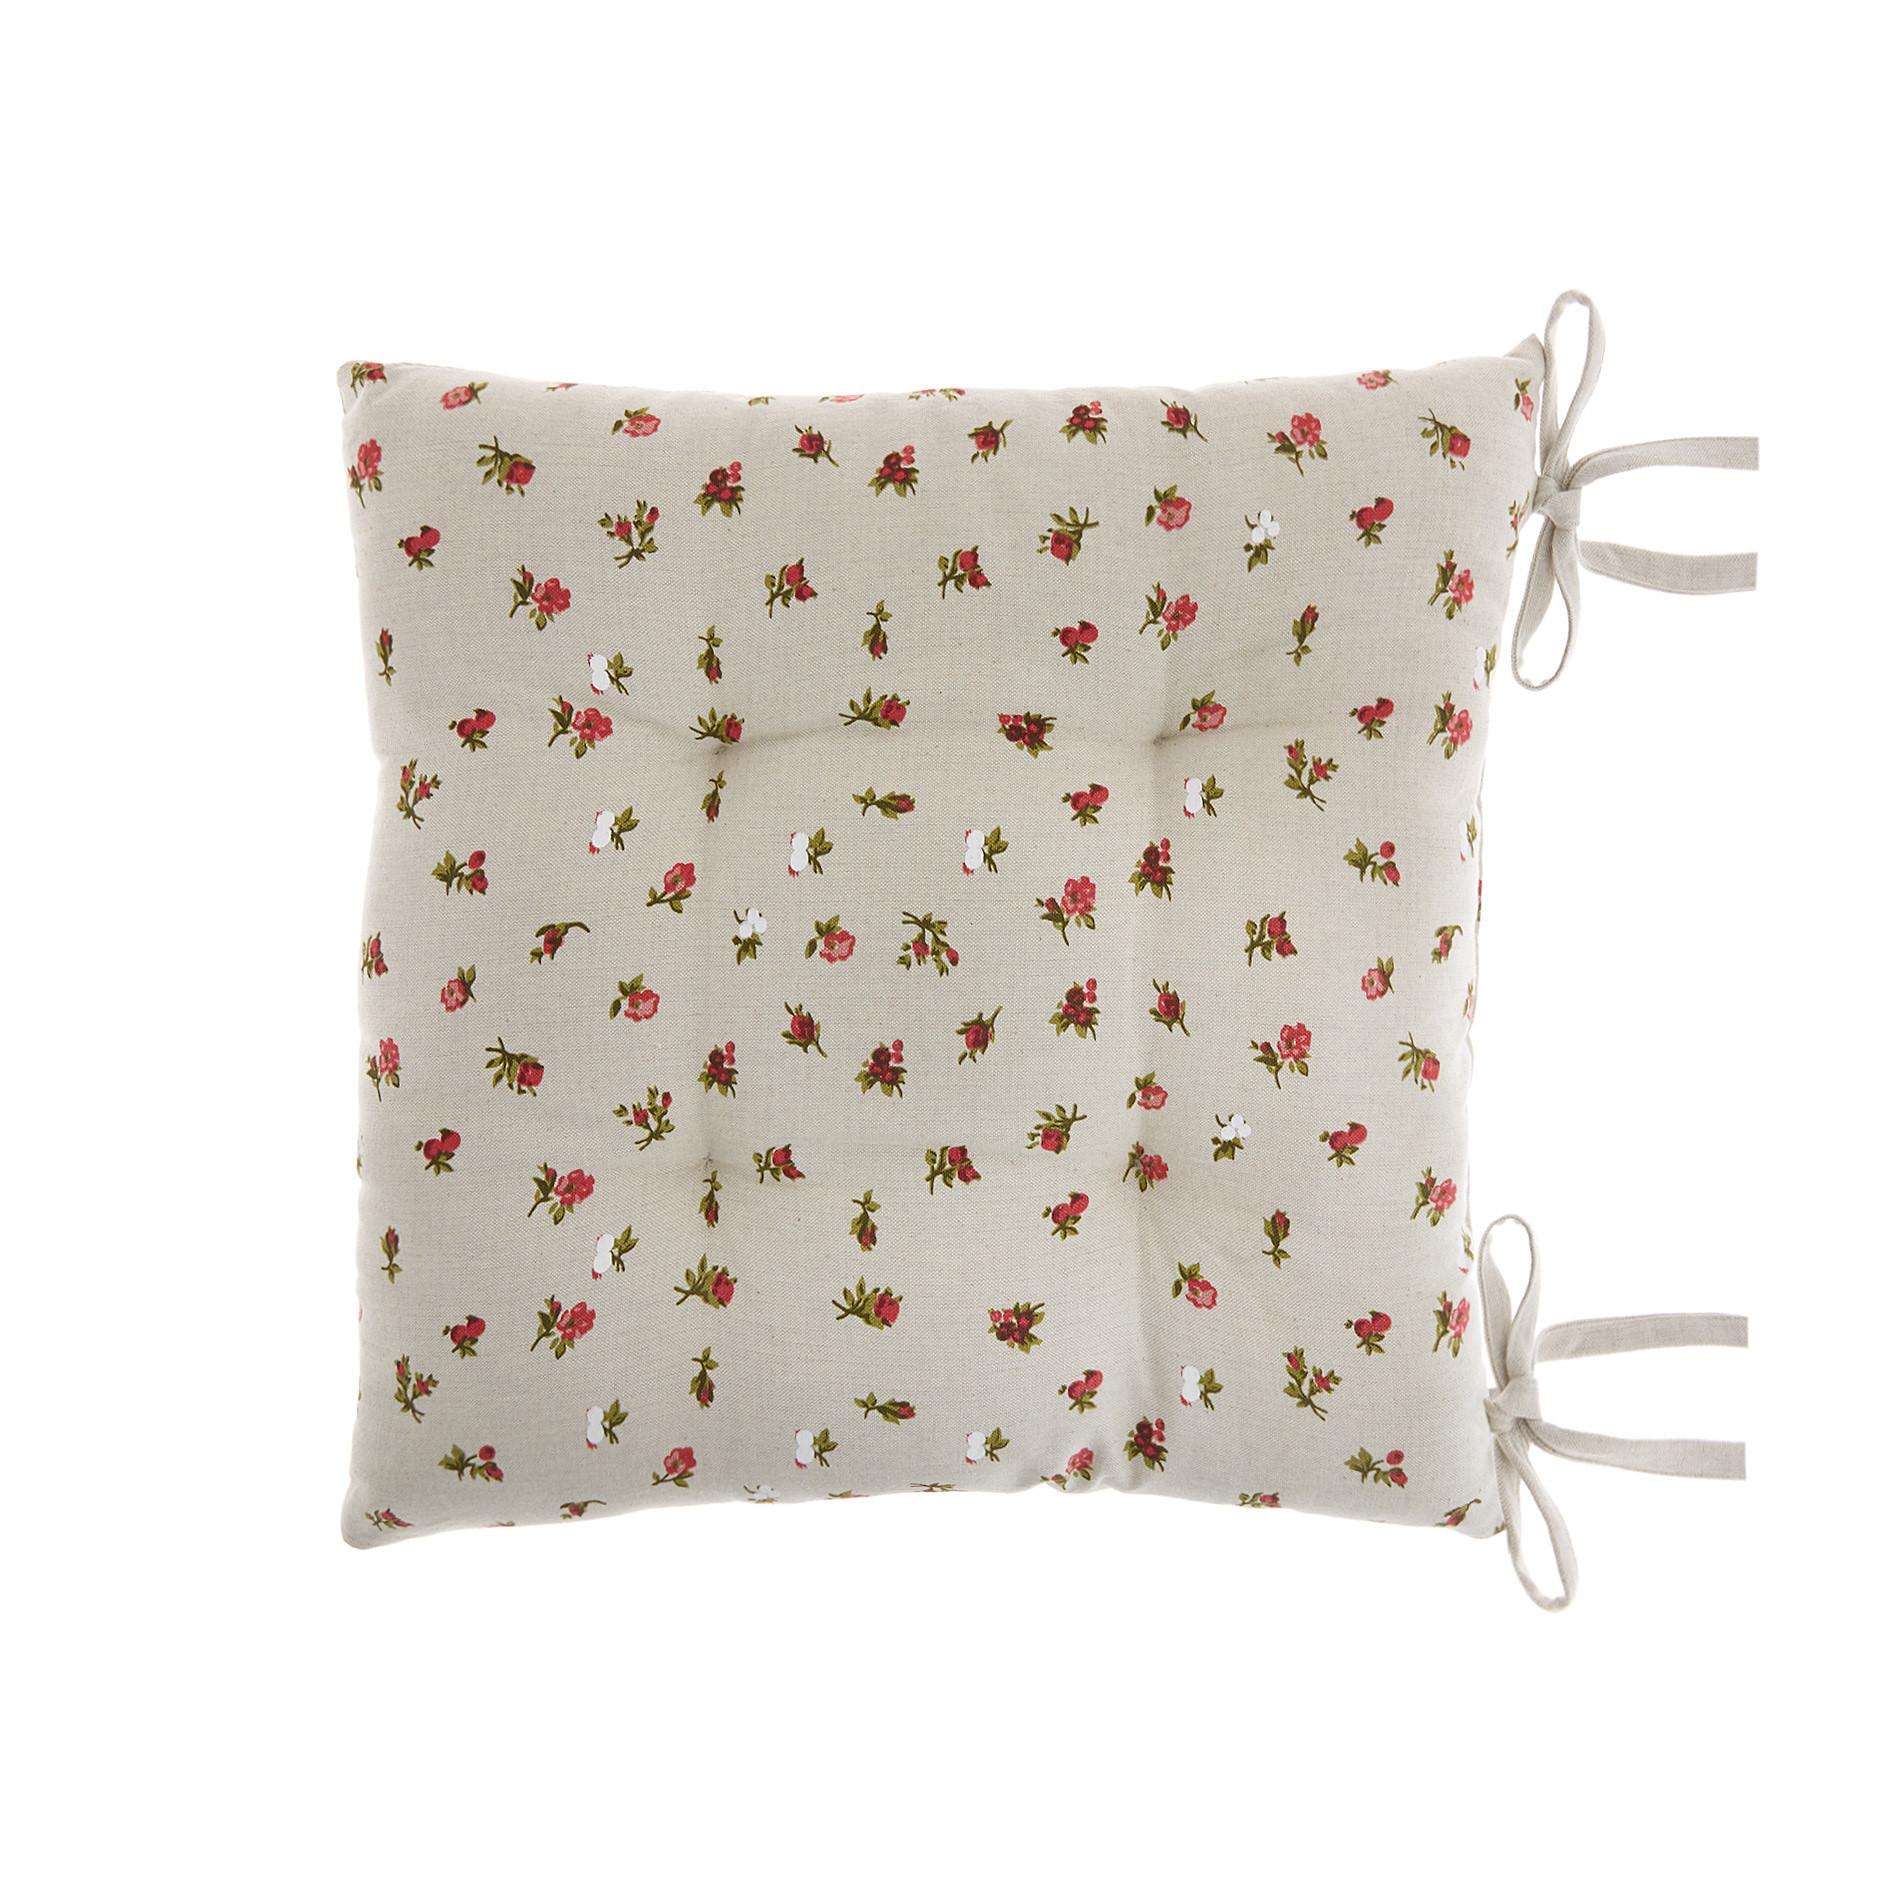 Cuscino da sedia puro cotone stampa fiorellini, Beige, large image number 0